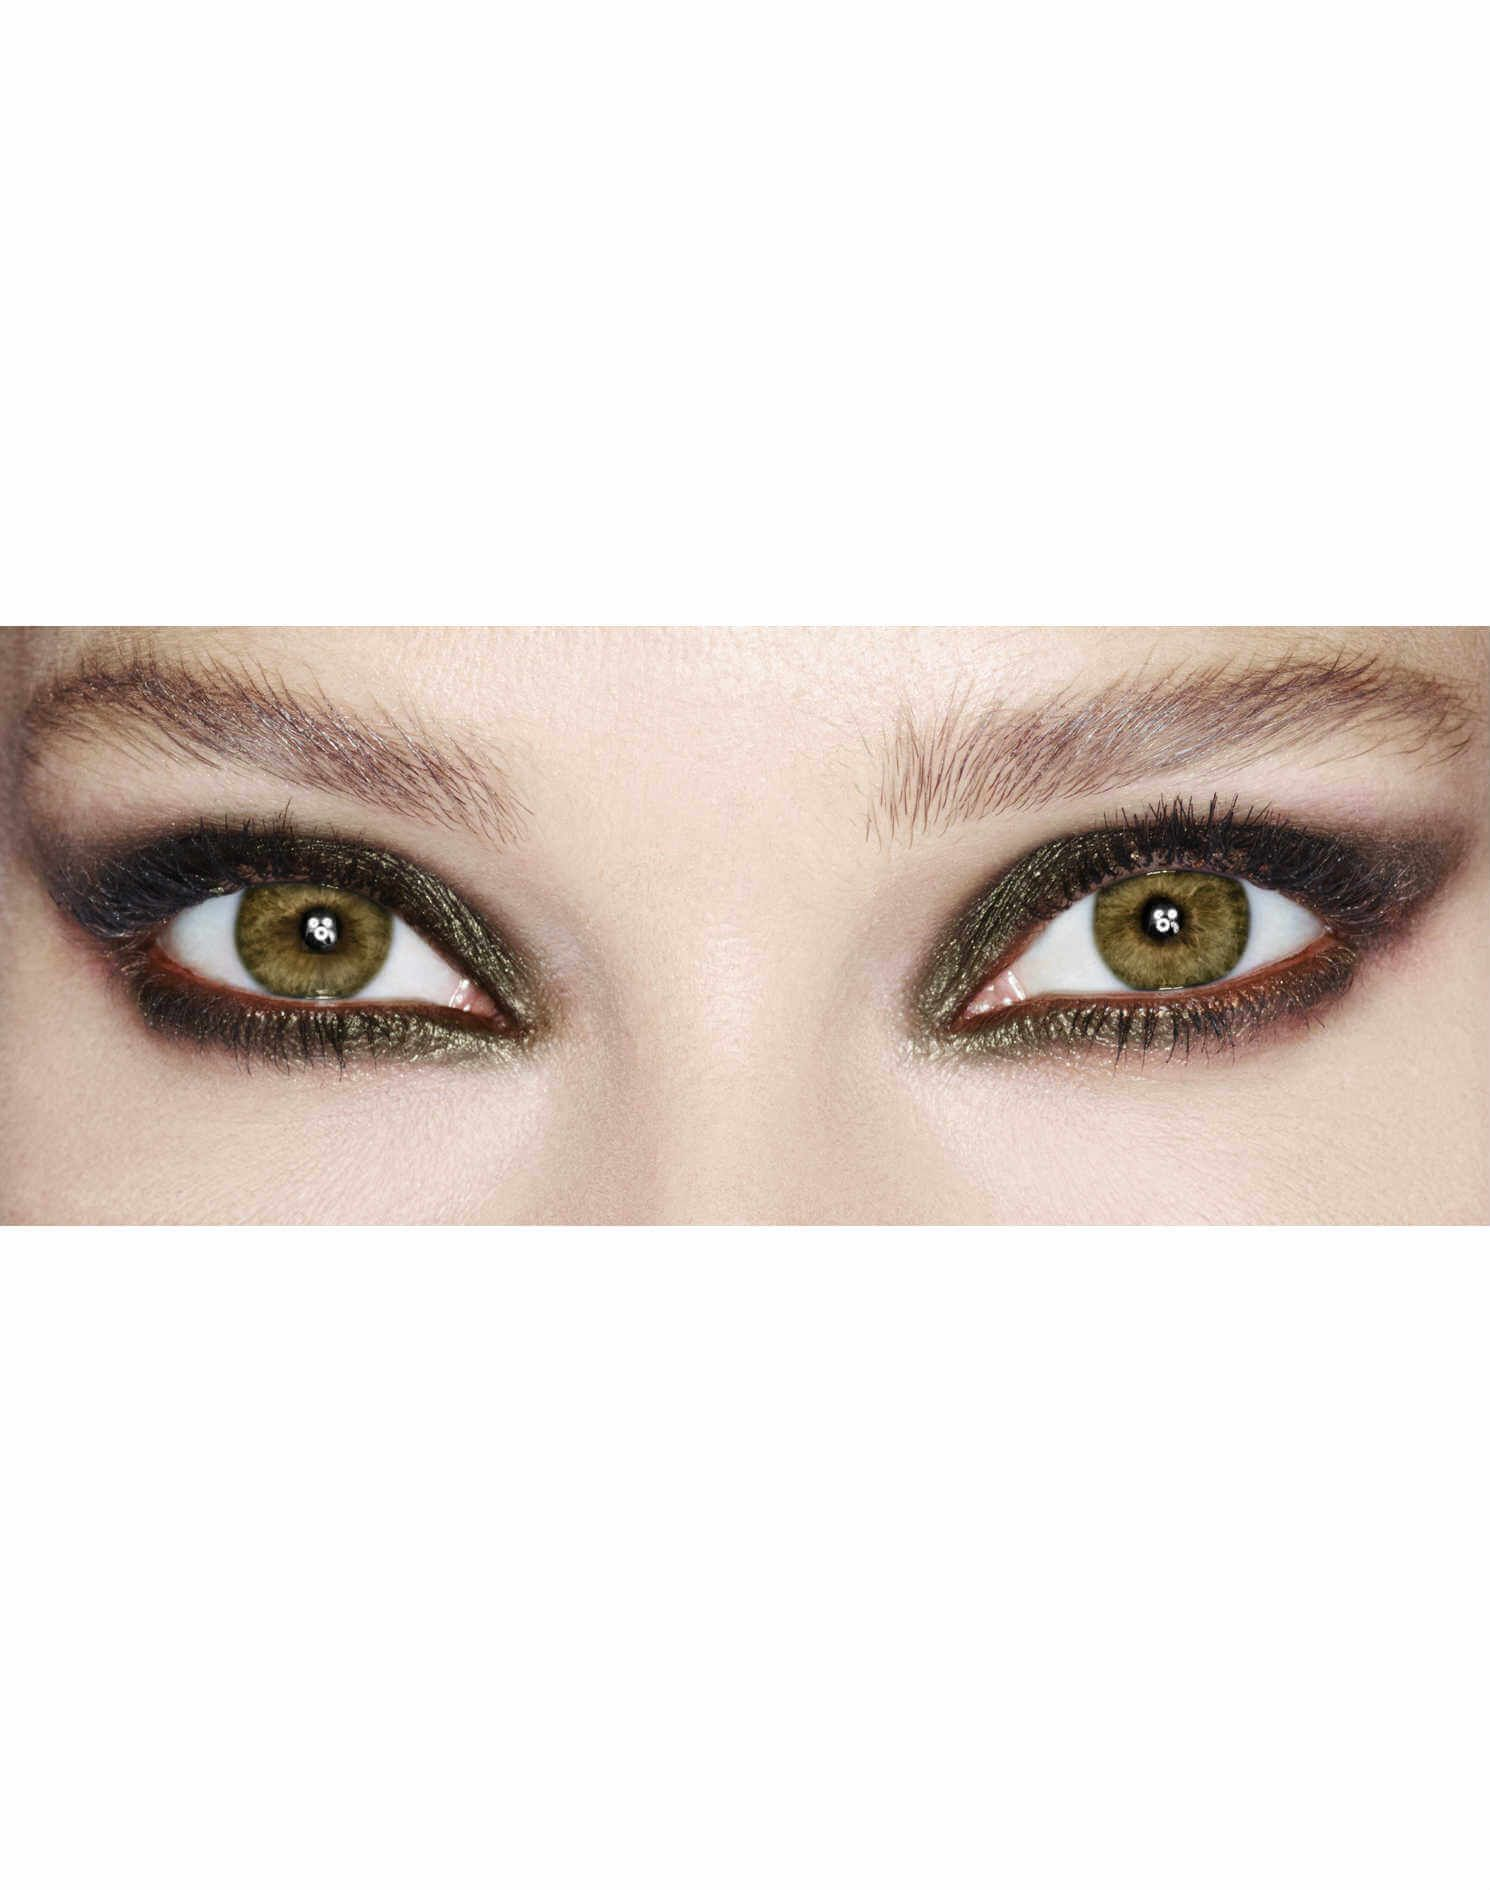 colour morphing eyeshadow pencil for hazel eyes | eyes | pinterest